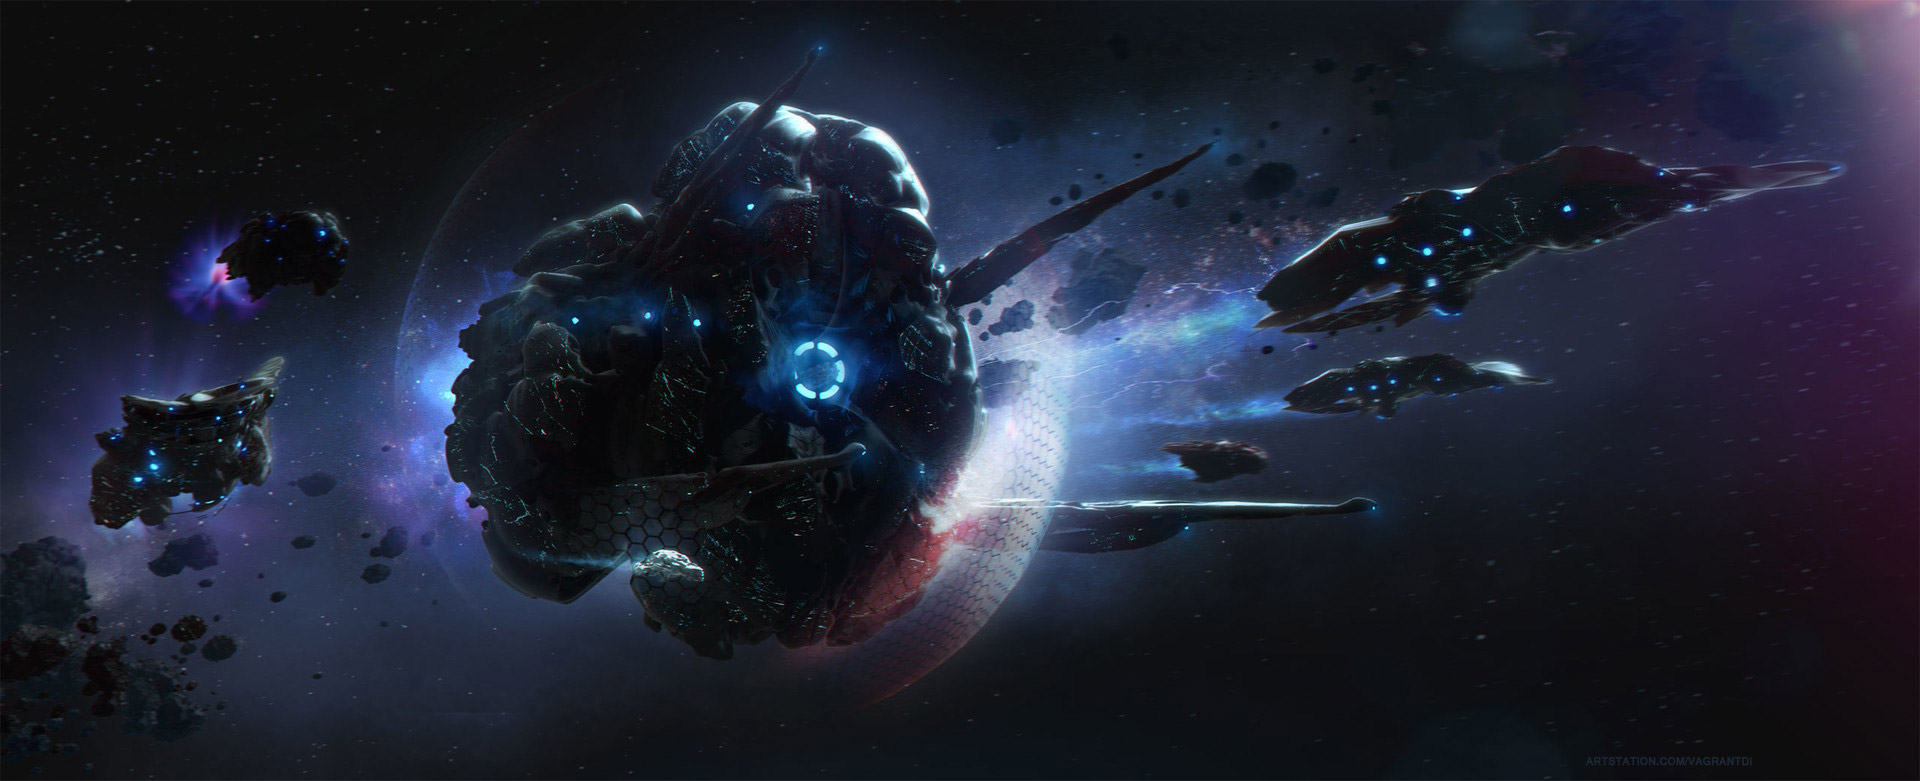 The Digital Science Fiction Art of Vitali Timkin